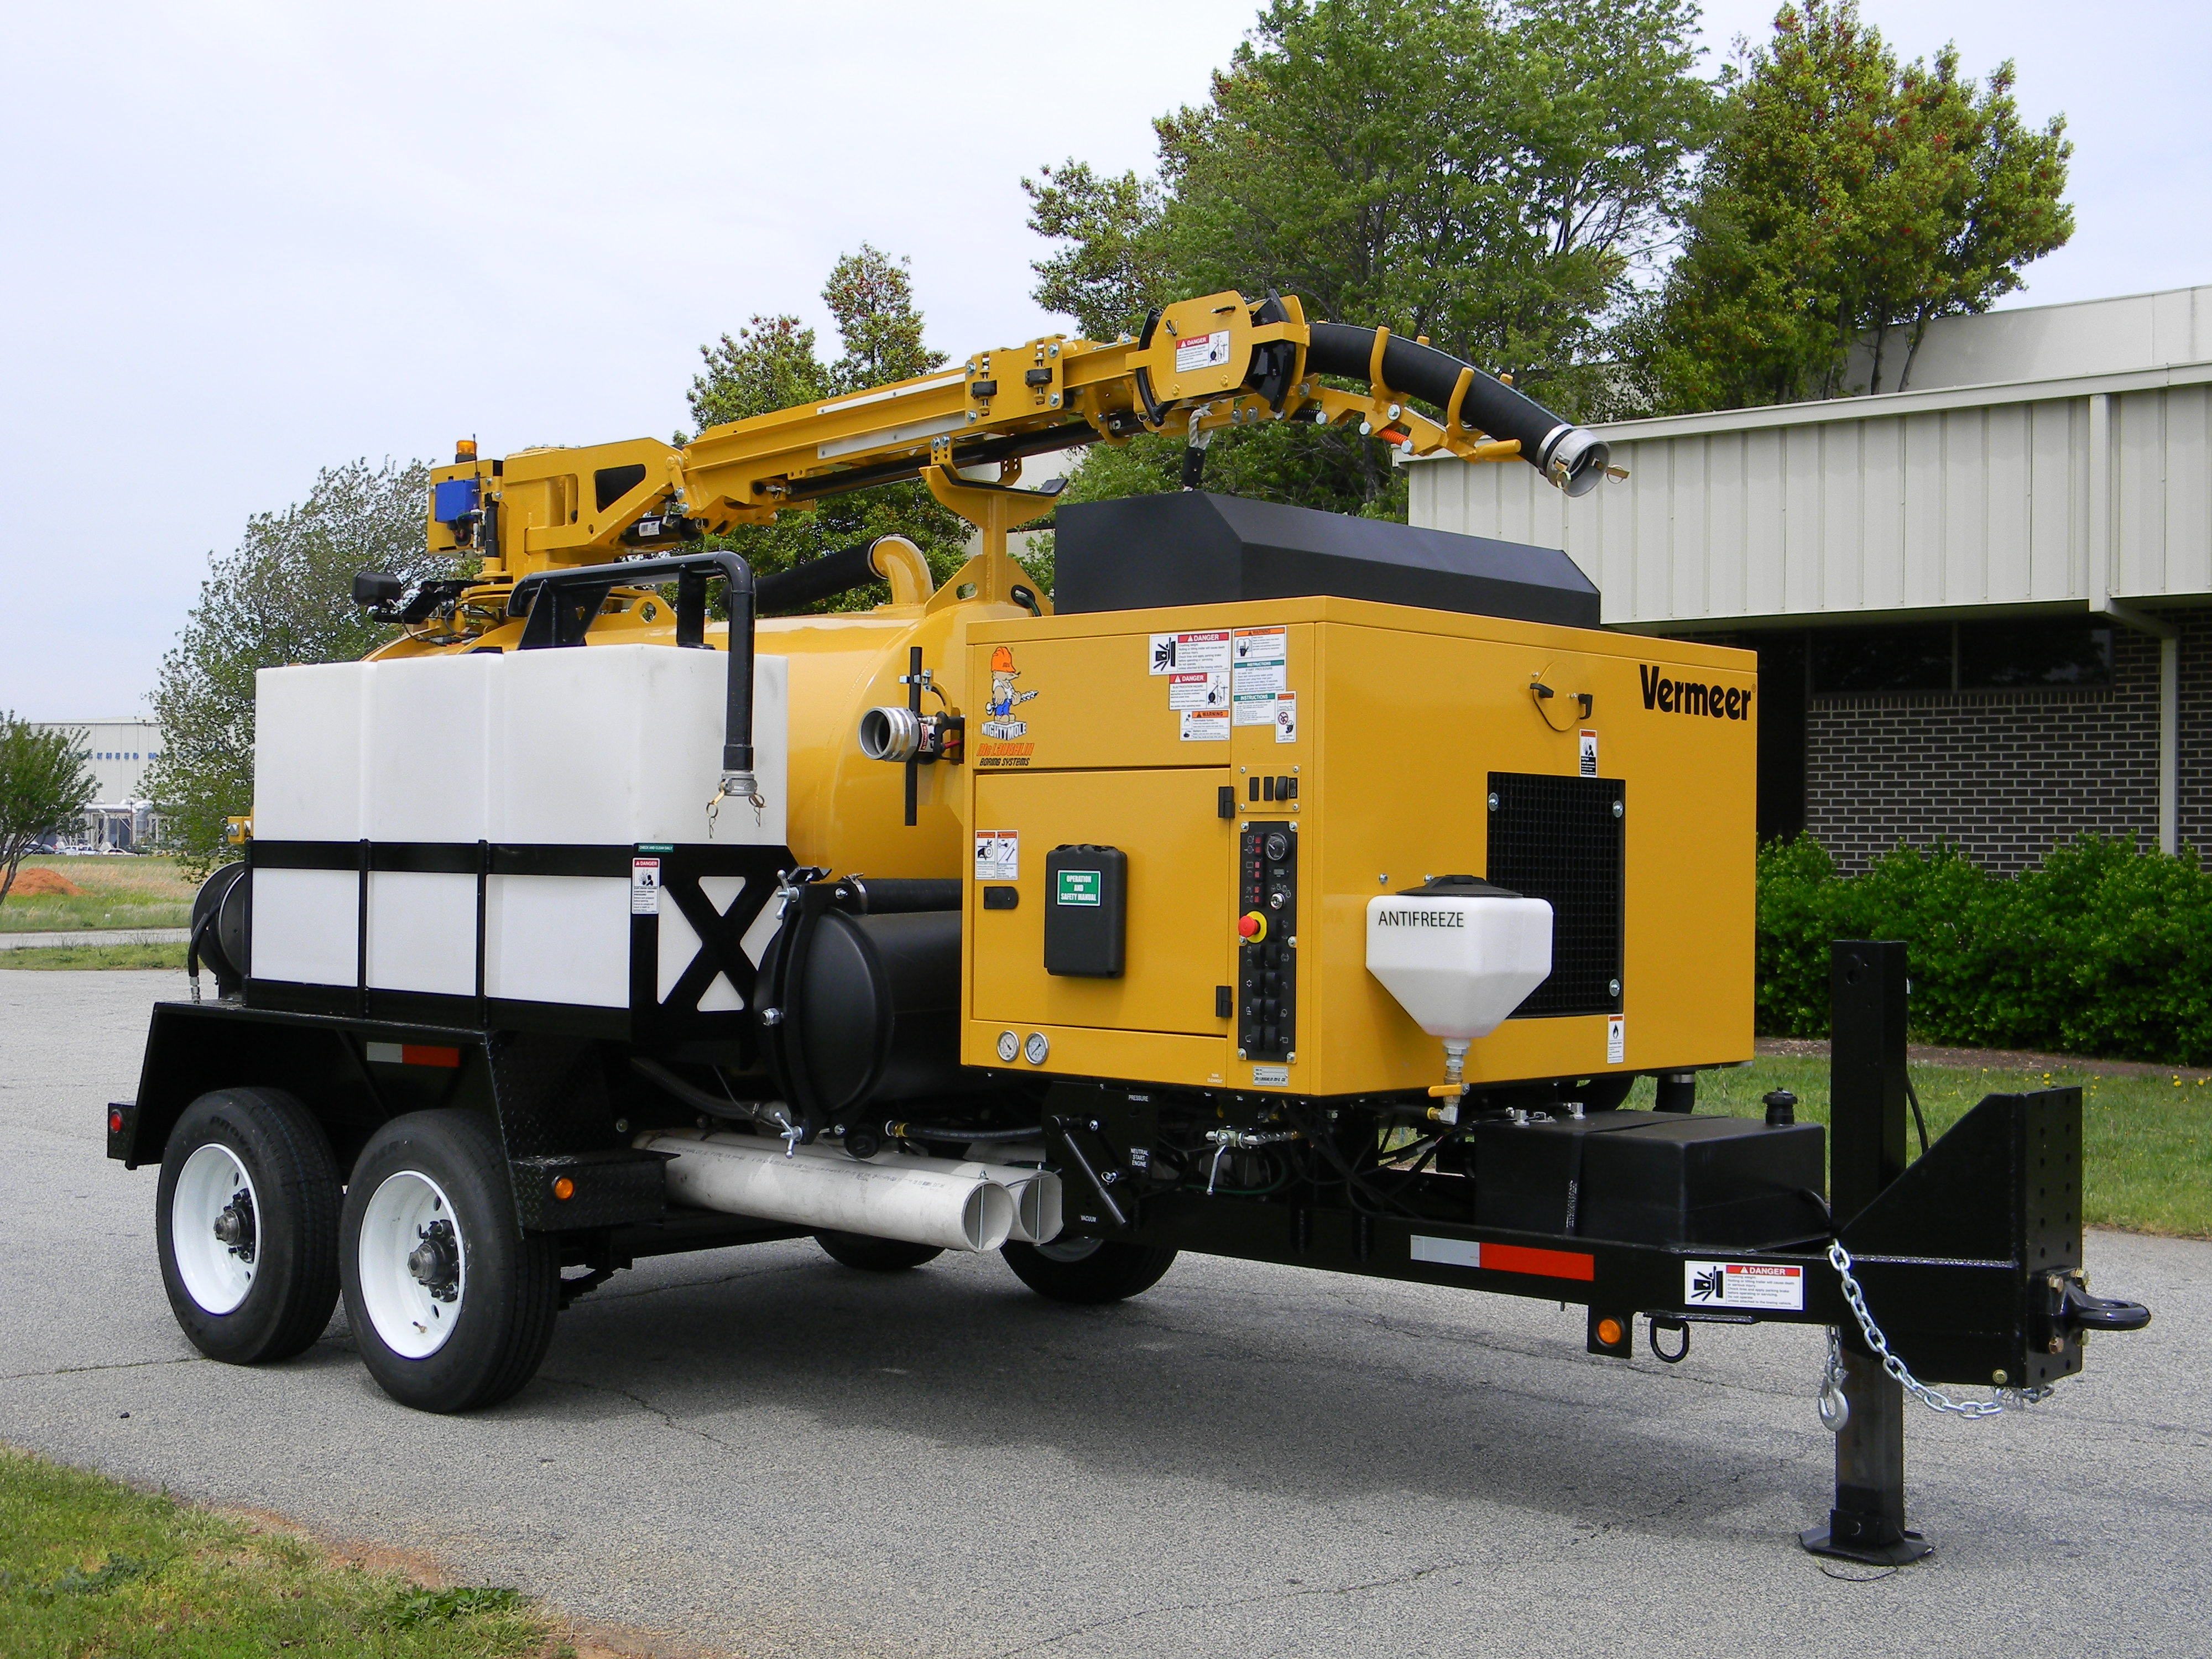 v800lehd-2013-upgraded-trailer